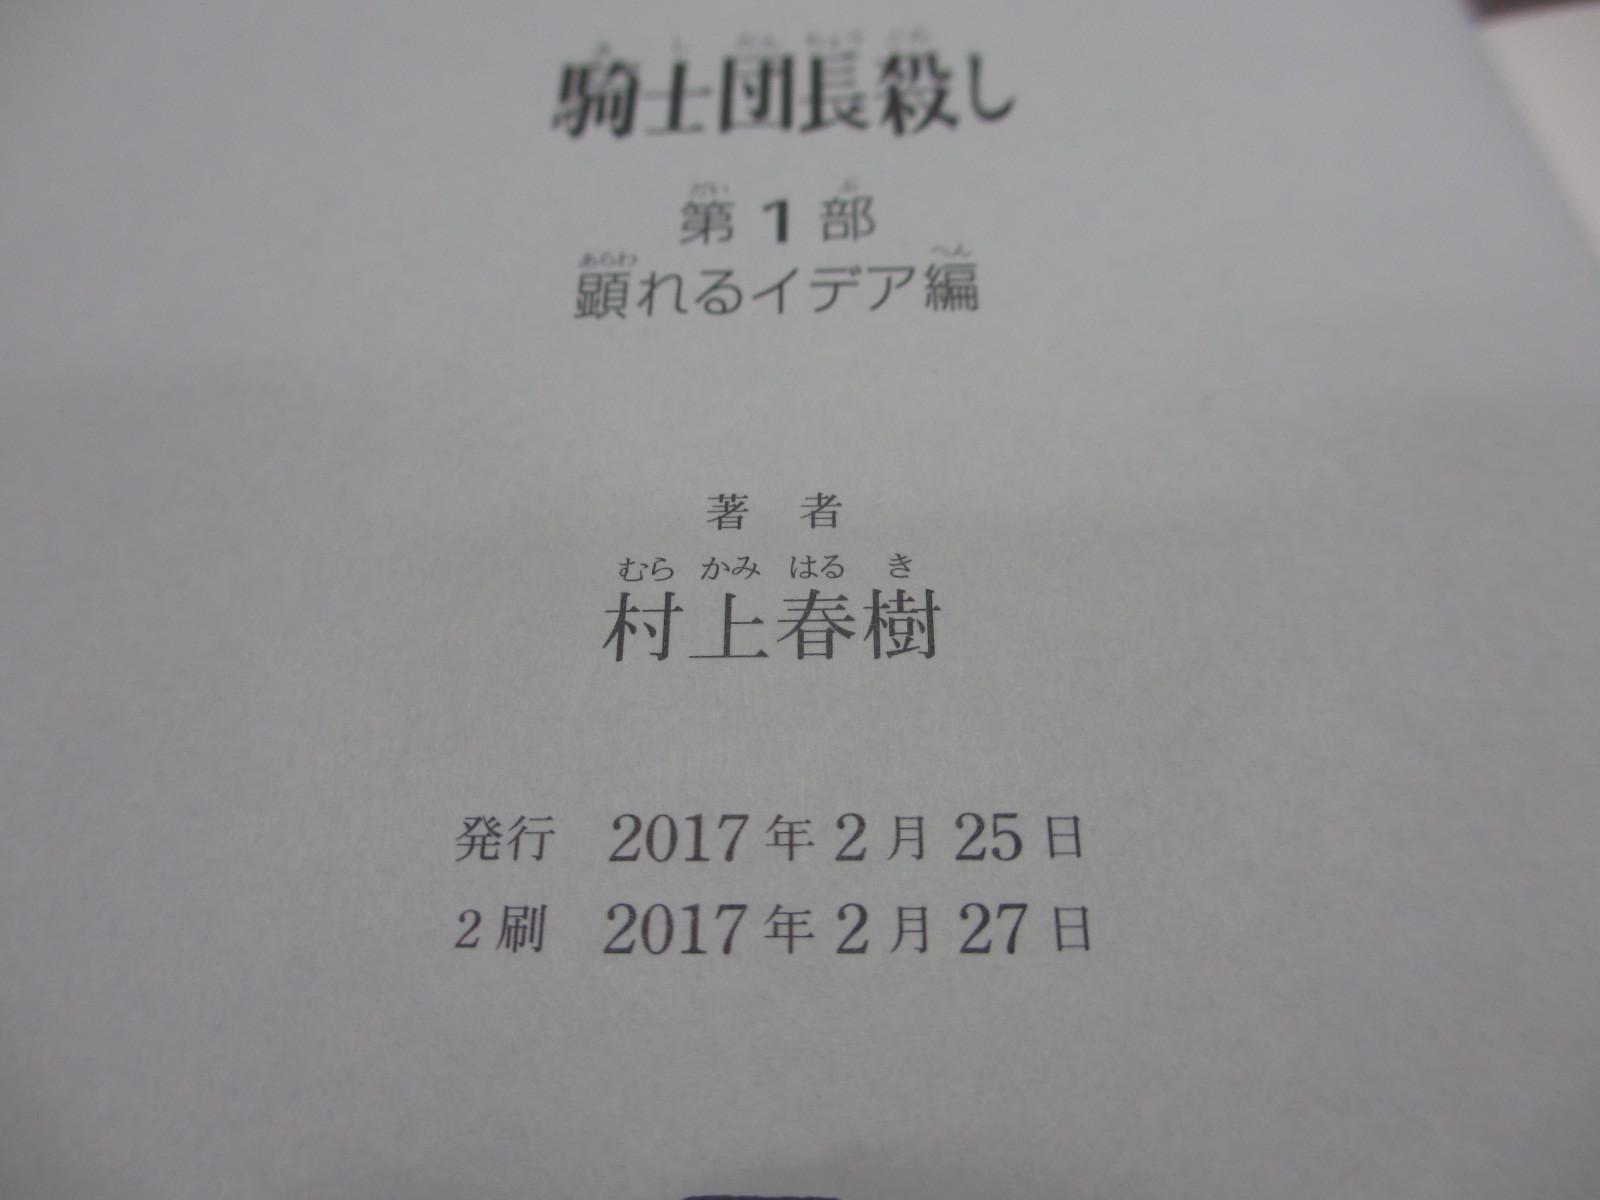 本日到着「騎士団長殺し」_e0150006_15520622.jpg